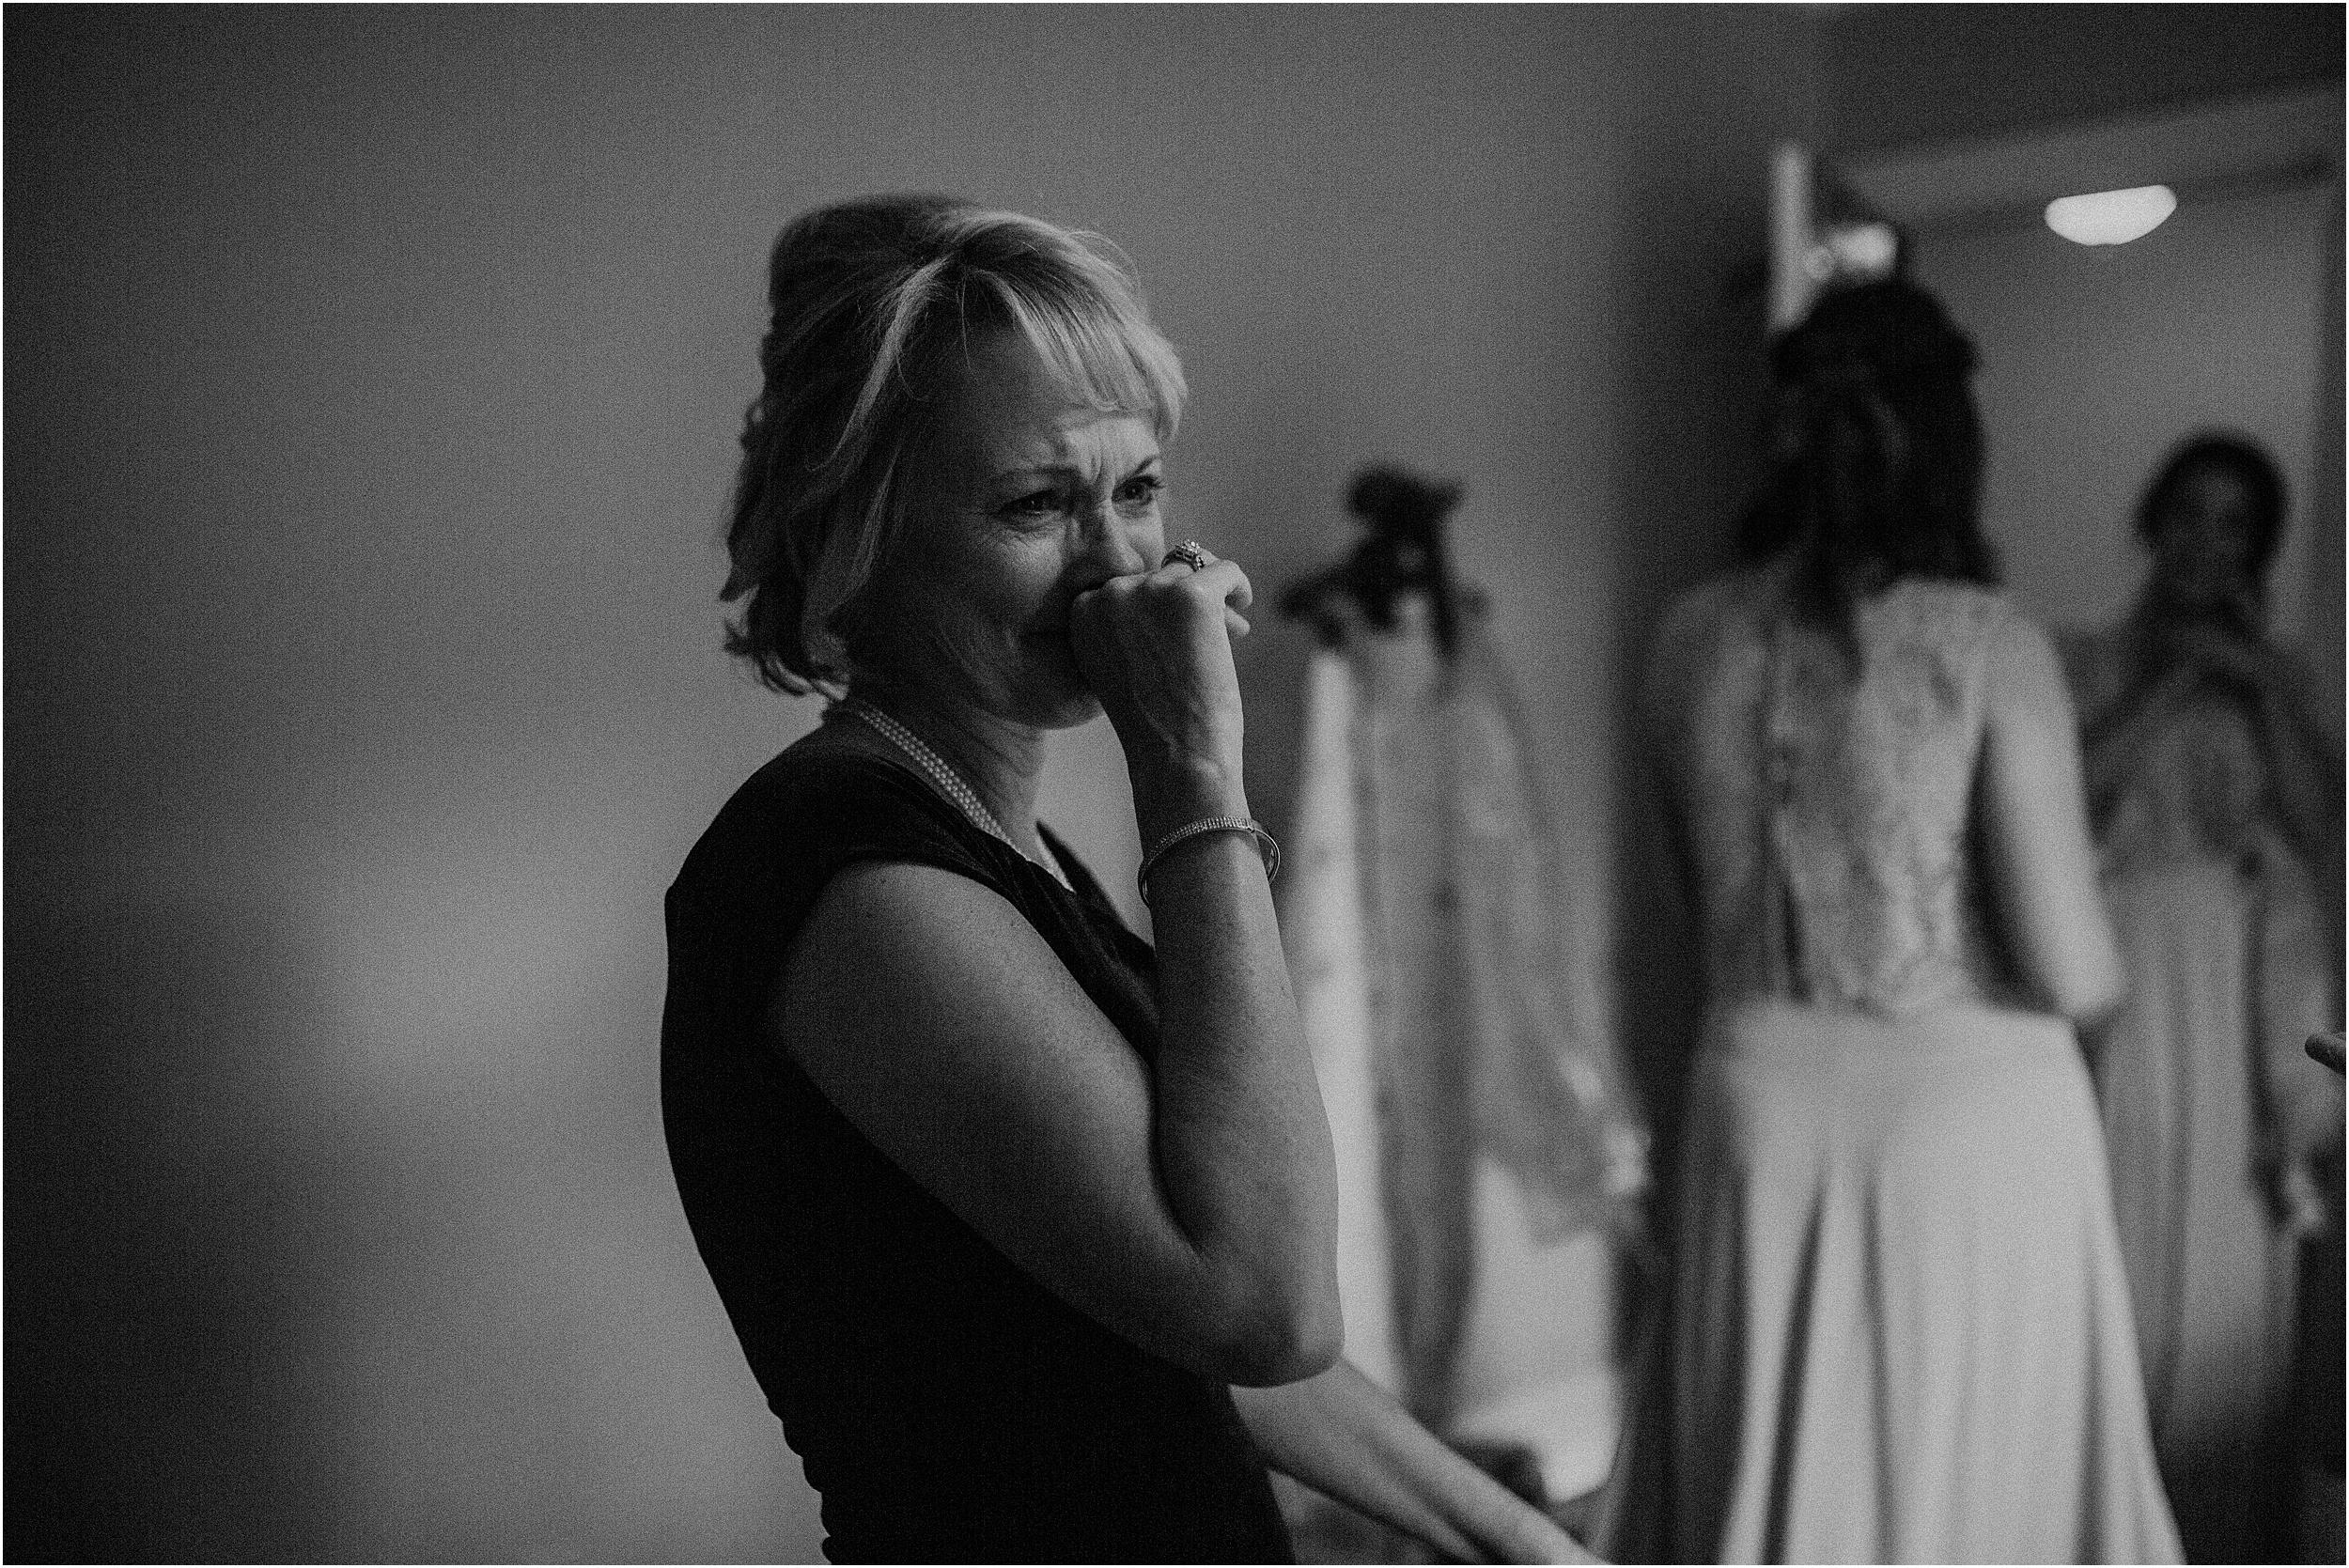 chicago_wedding_photographer_wright_photographs_0093.jpg